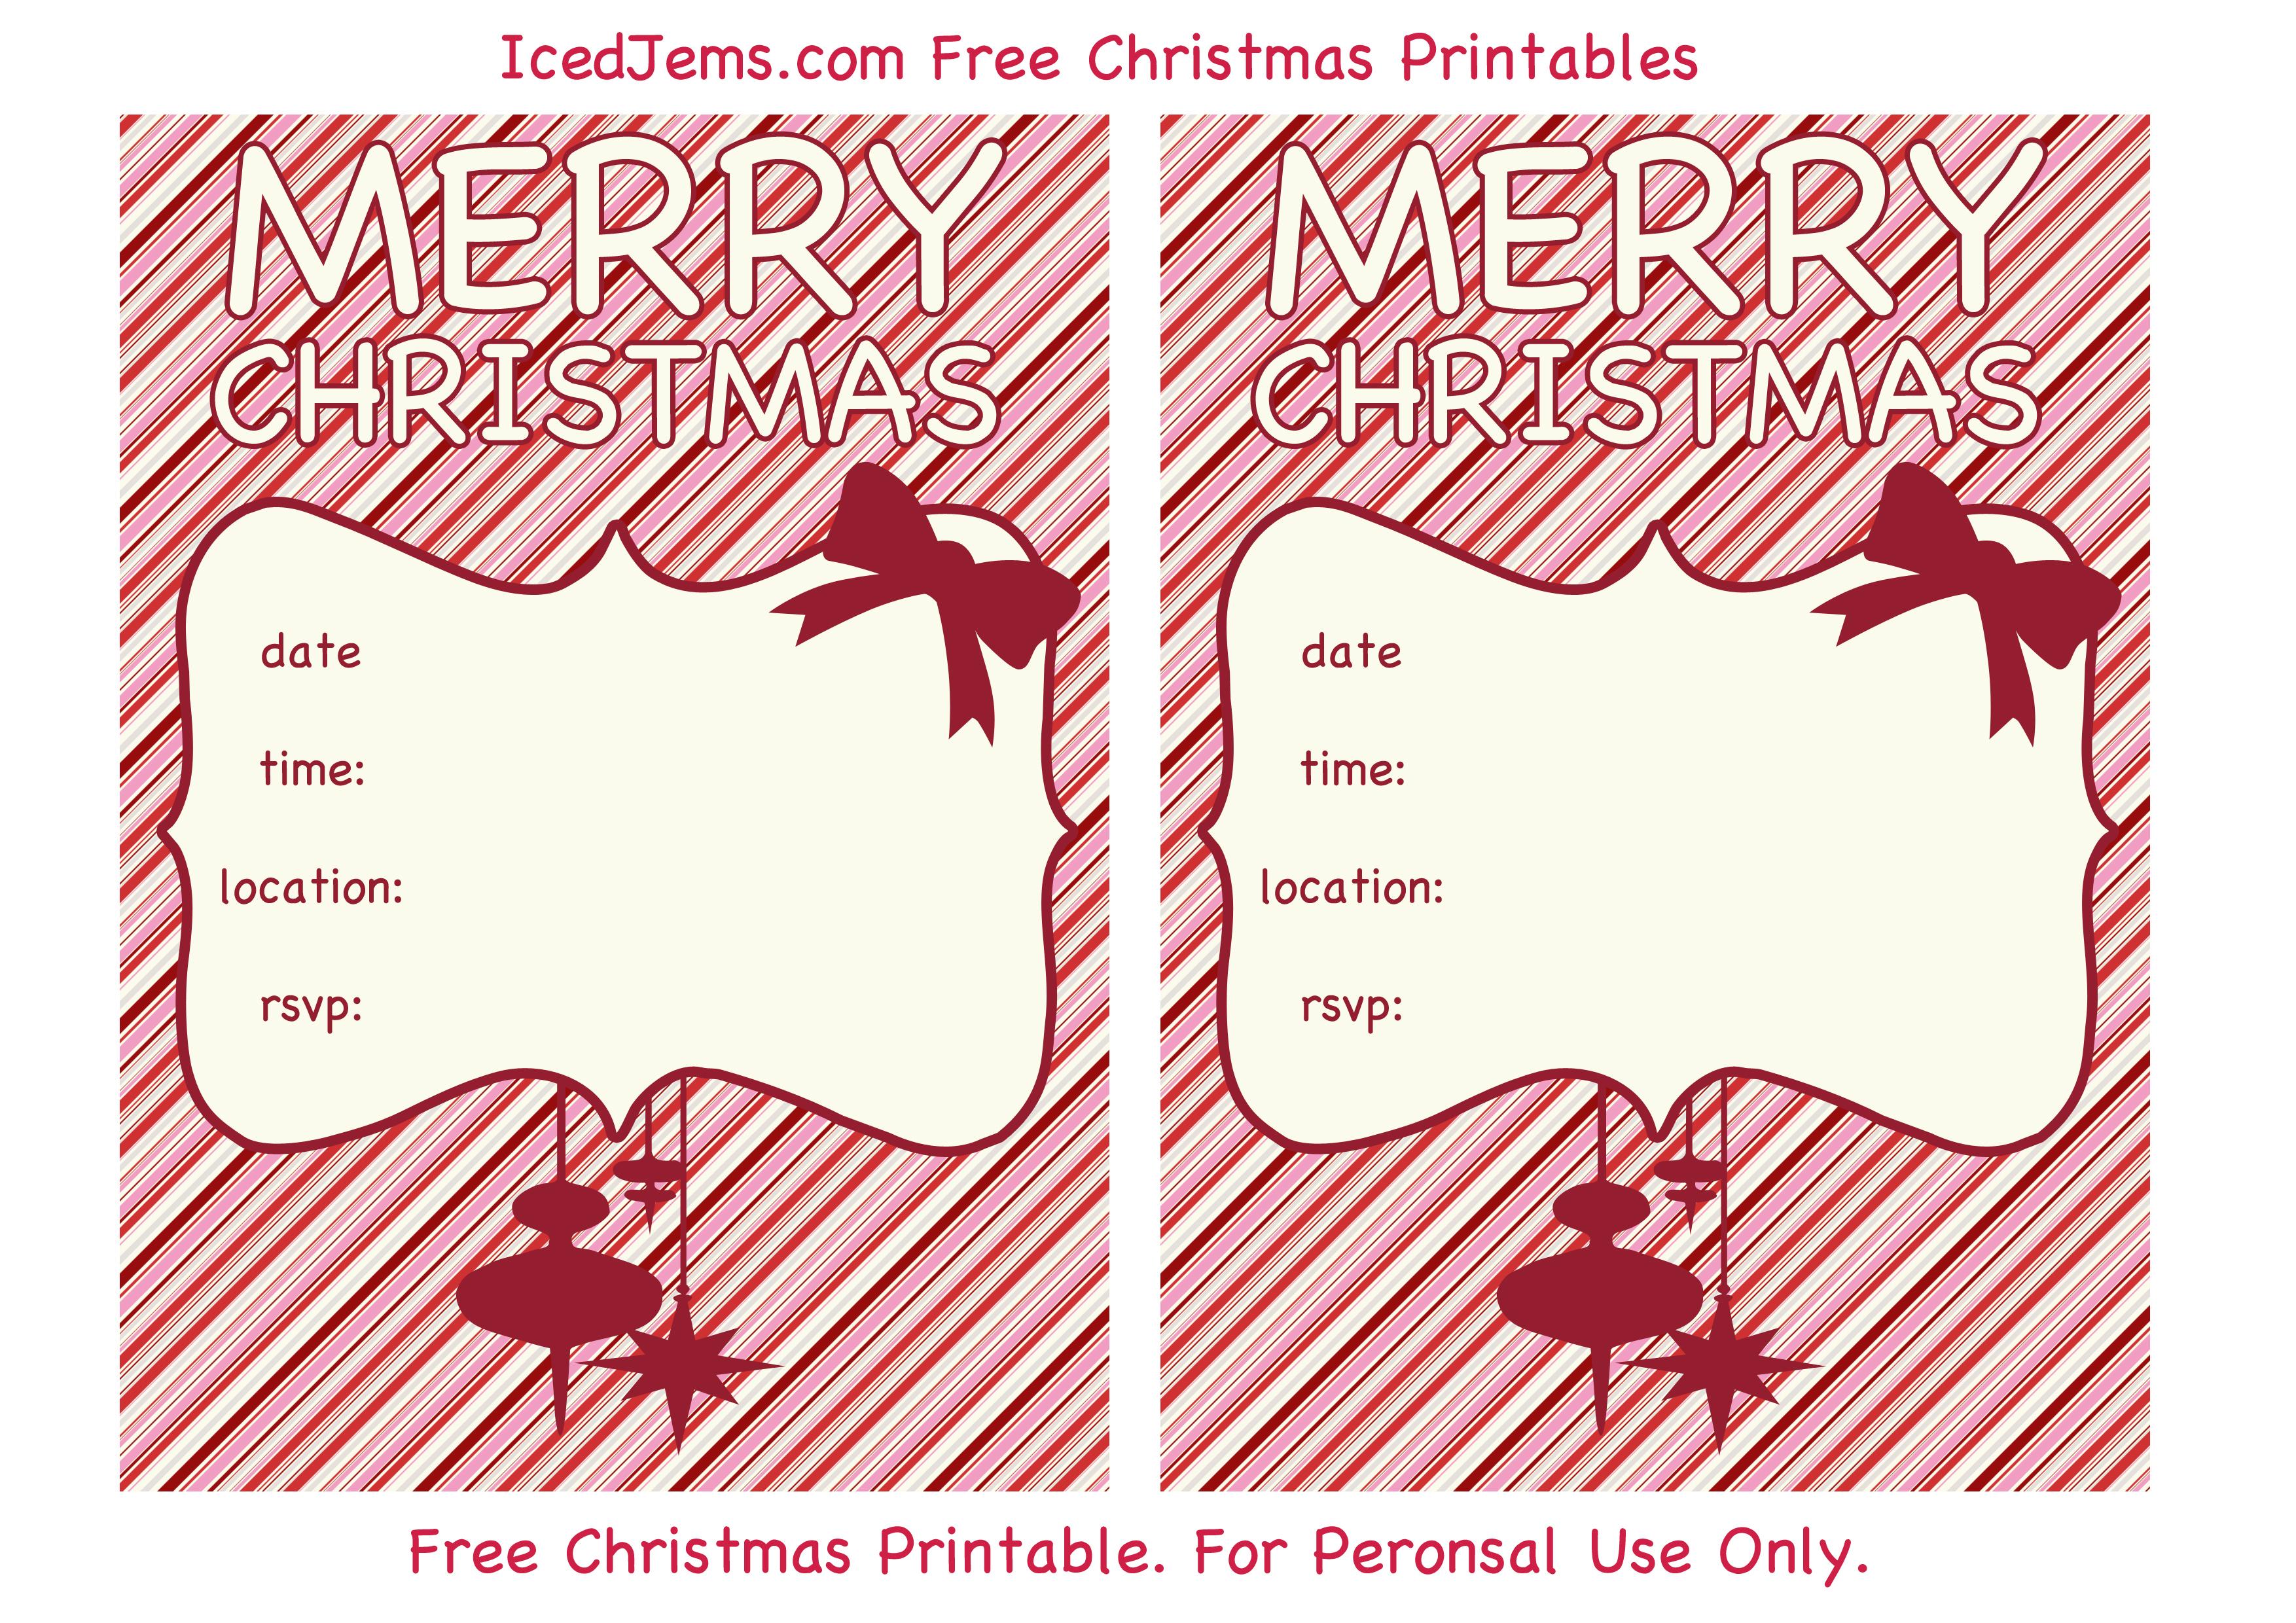 009 Christmas Party Invite Template Ideas Printable Invitations - Christmas Party Invitation Templates Free Printable